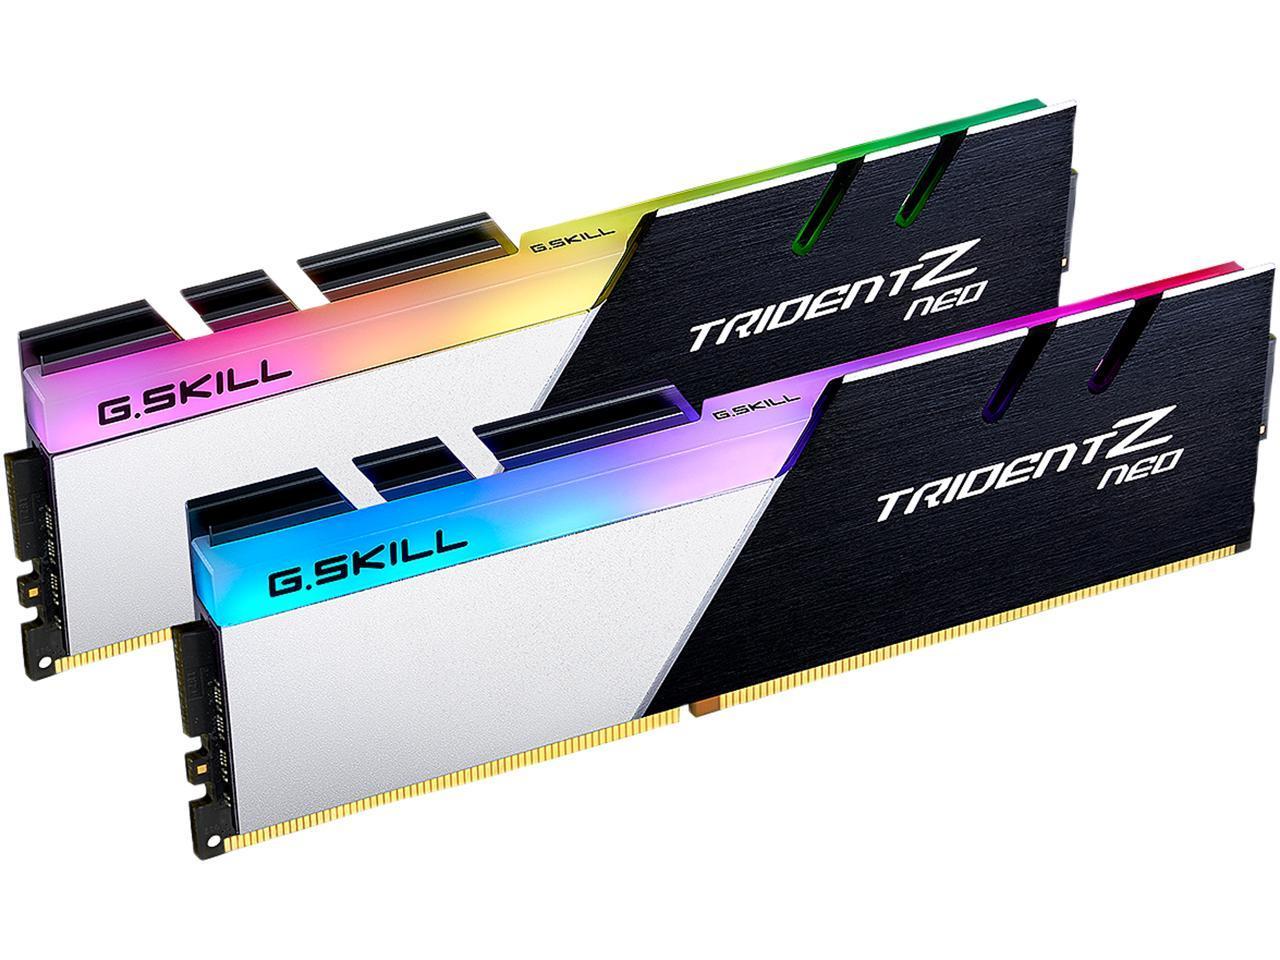 G Skill Trident Z Neo For Amd Ryzen Series 32gb 2 X 16gb 288 Pin Rgb Ddr4 Sdram Ddr4 3200 Pc4 25600 Desktop Memory Model F4 3200c16d 32gtzn Newegg Com